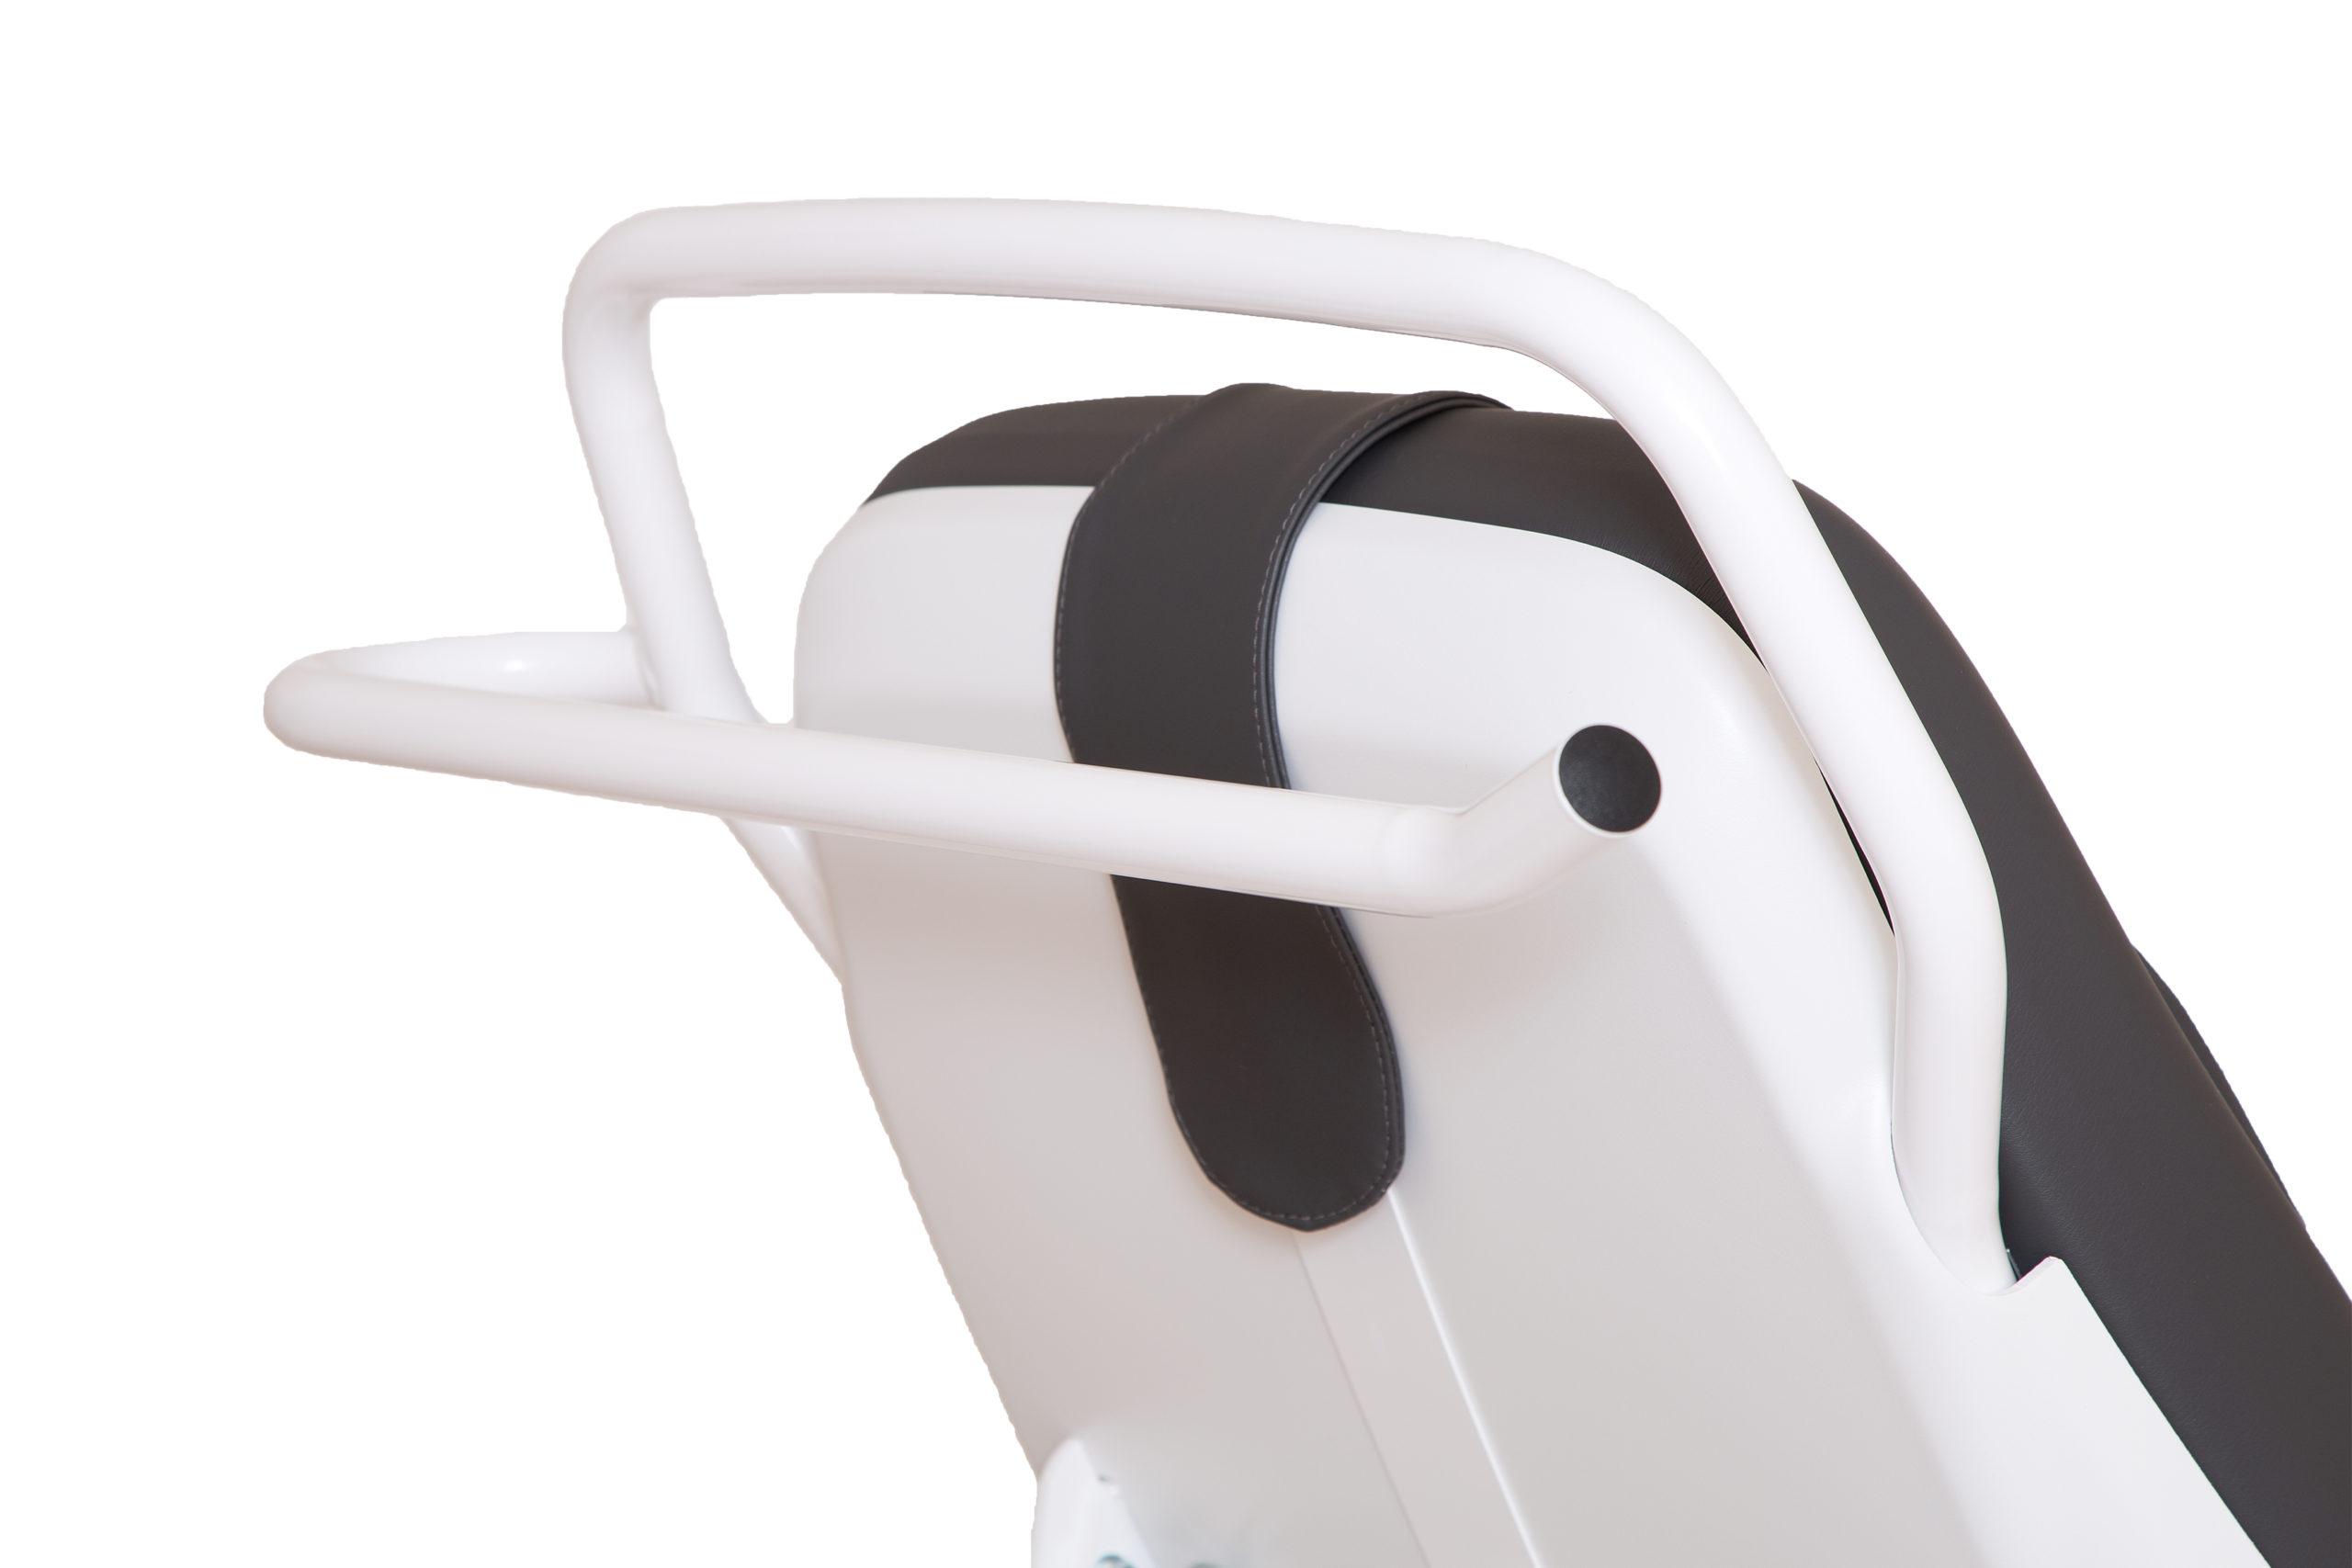 Paper-towel-holder-scaled.jpg